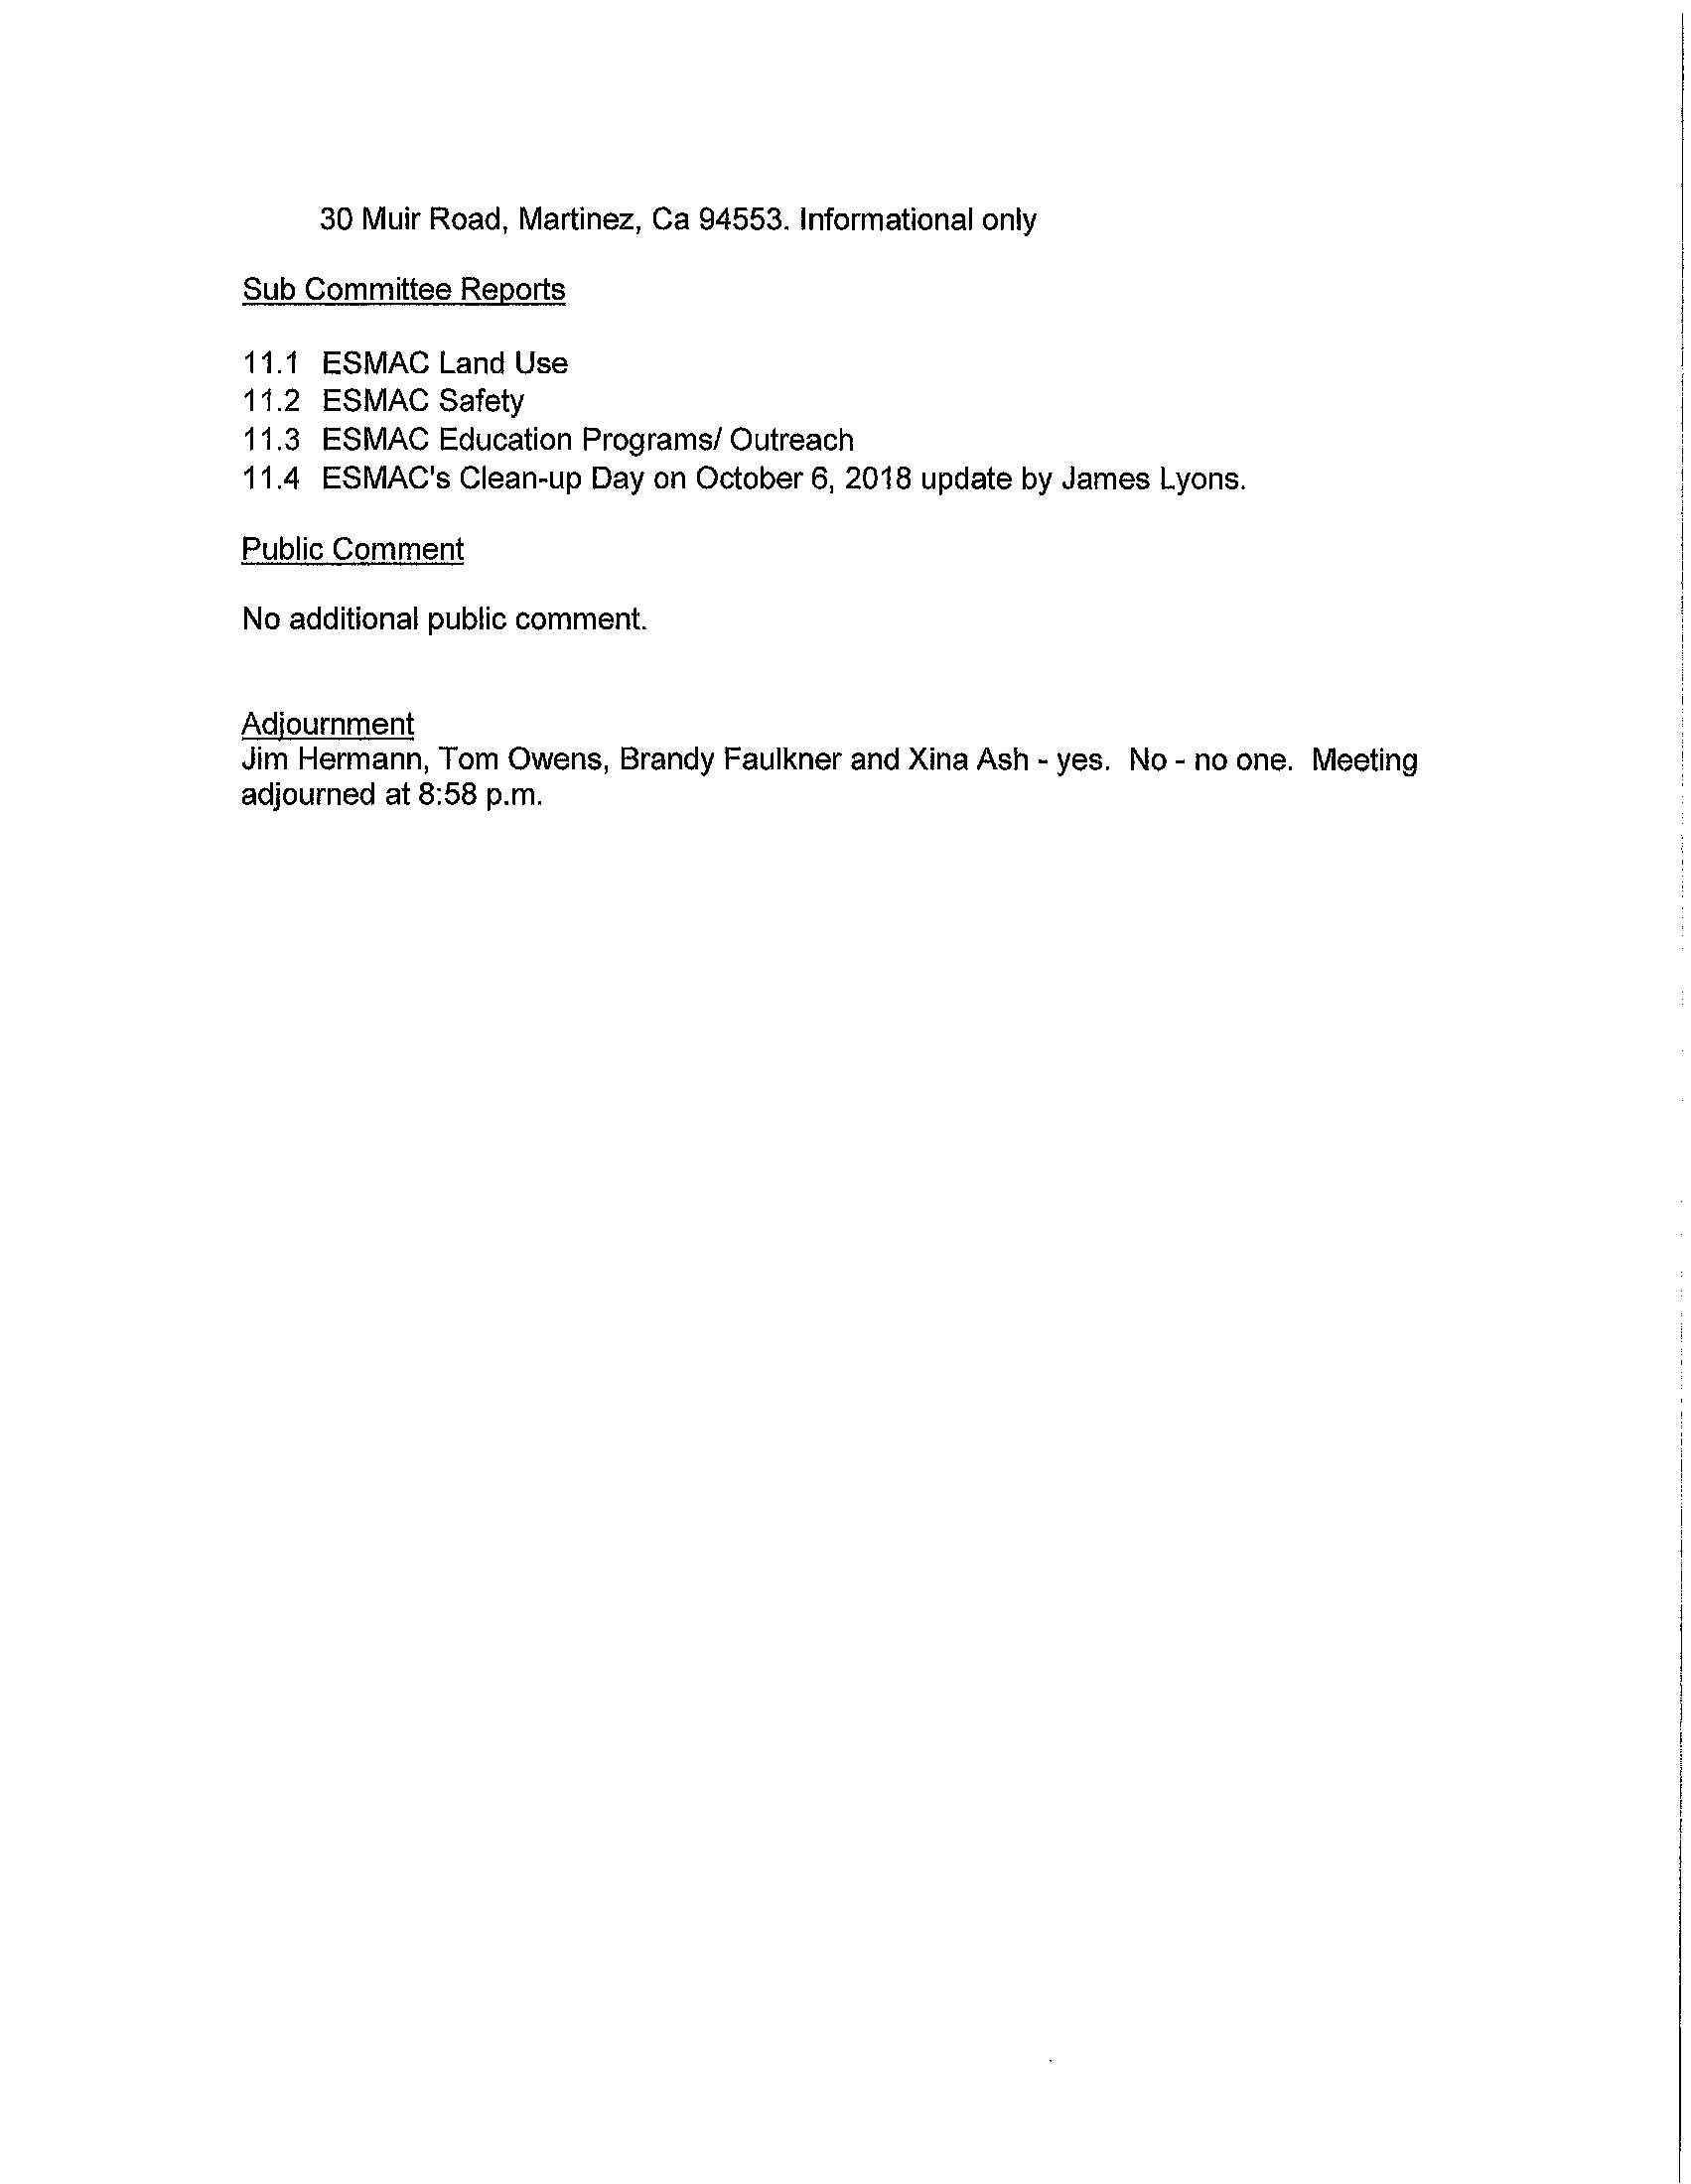 ESMAC Agenda 11.14.2018 (46 Pages)_5.jpg